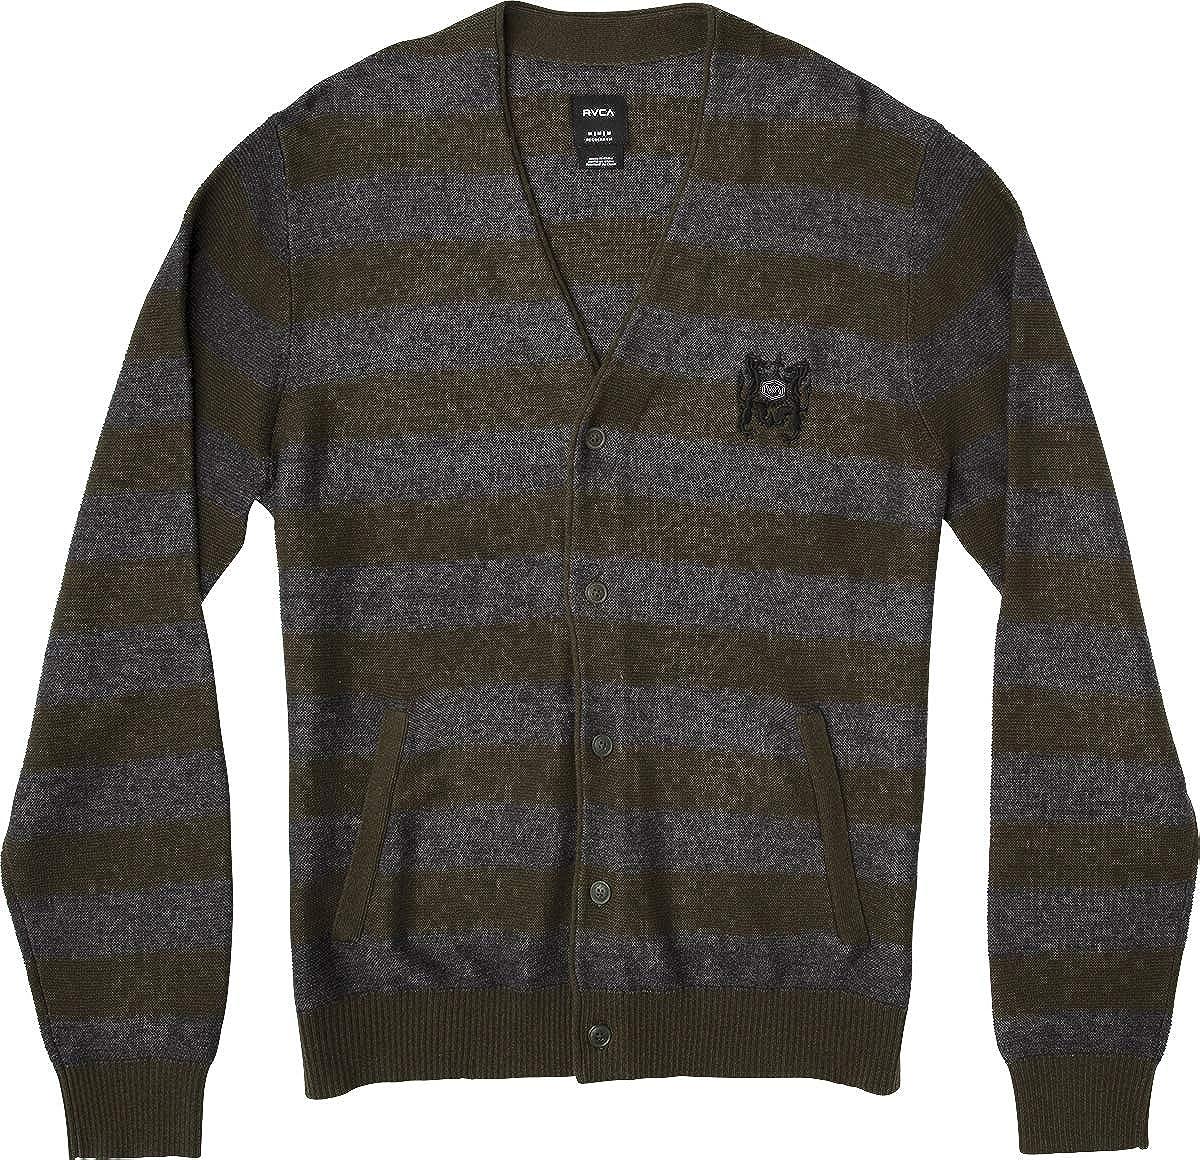 RVCA Men's Cali Cardigan Sweater, MV40SRCC